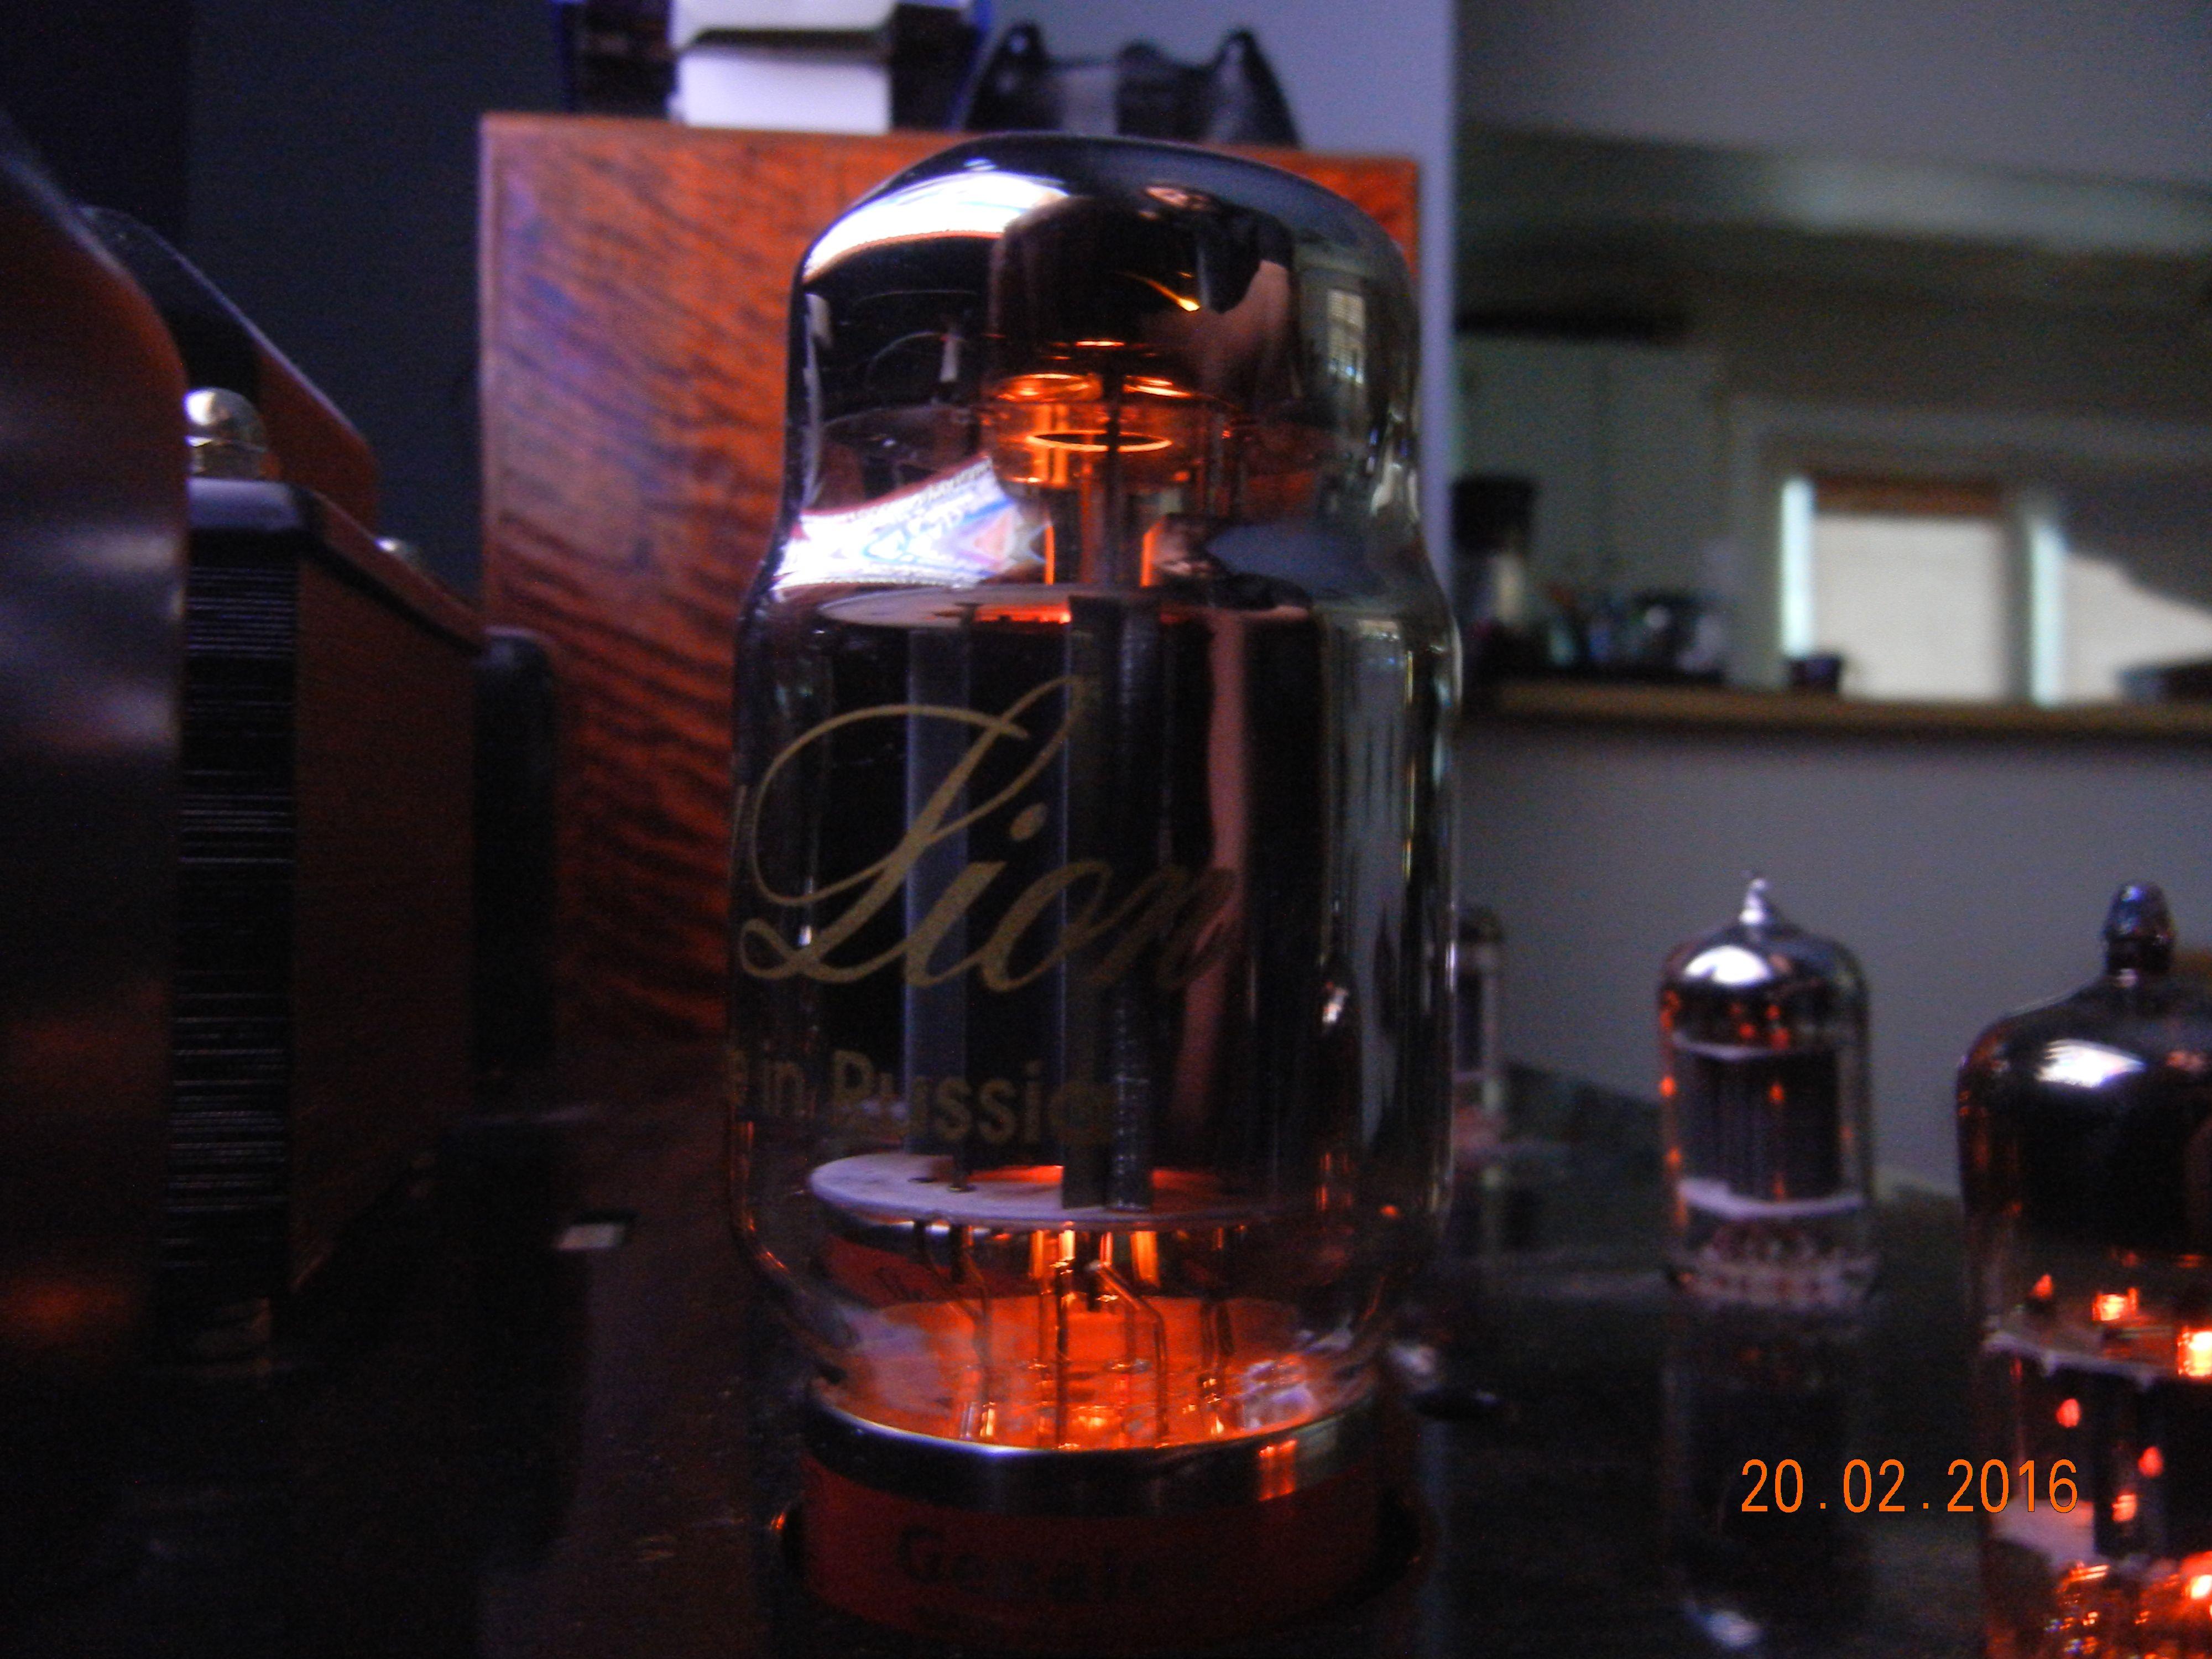 Gold Lion KT88, Telefunkin and Mullard tubes | Stereo